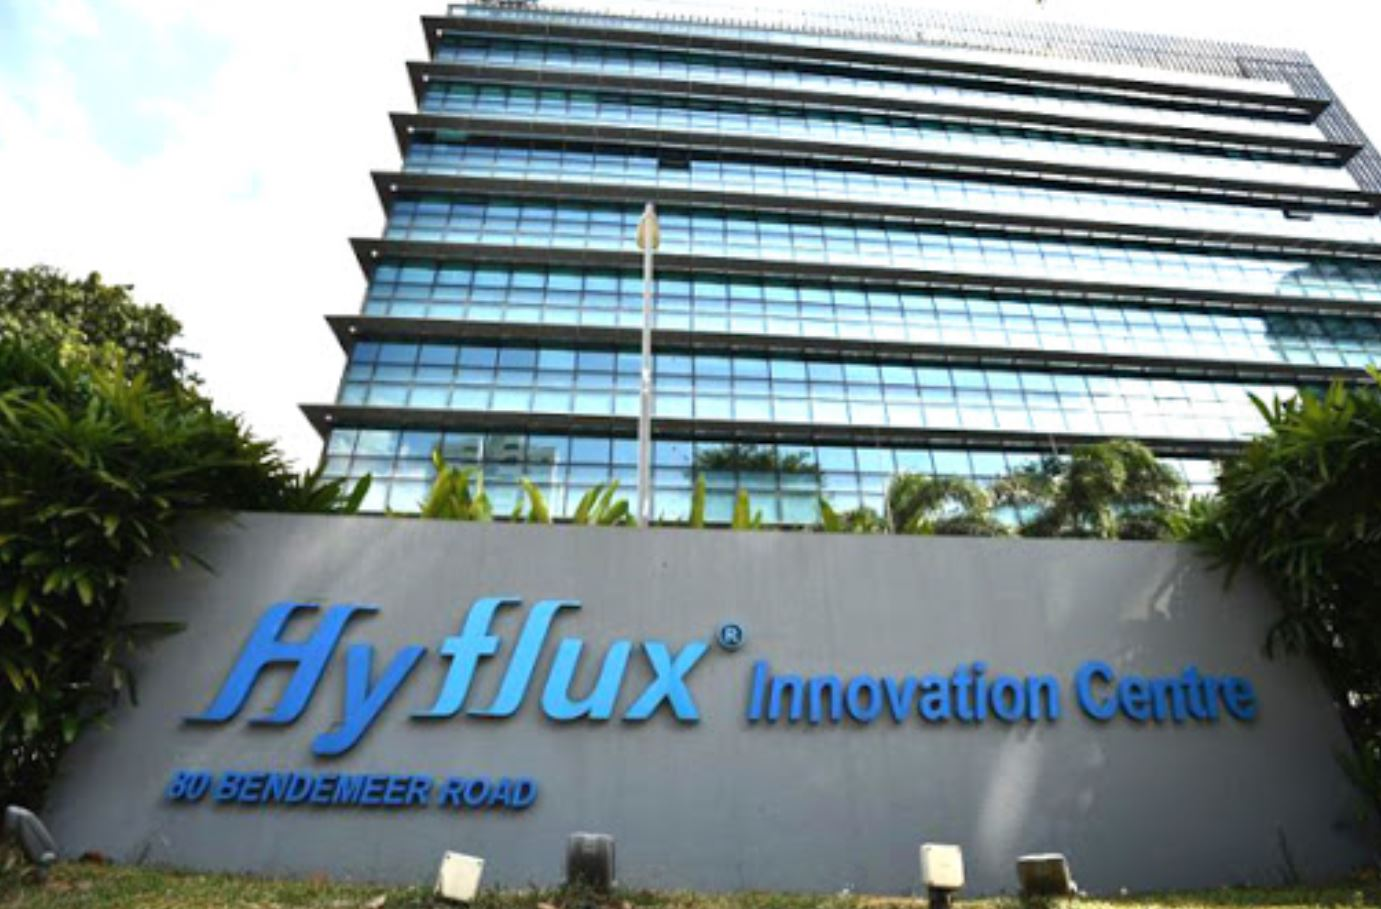 Utico extends Hyflux restructuring deadline to June 30